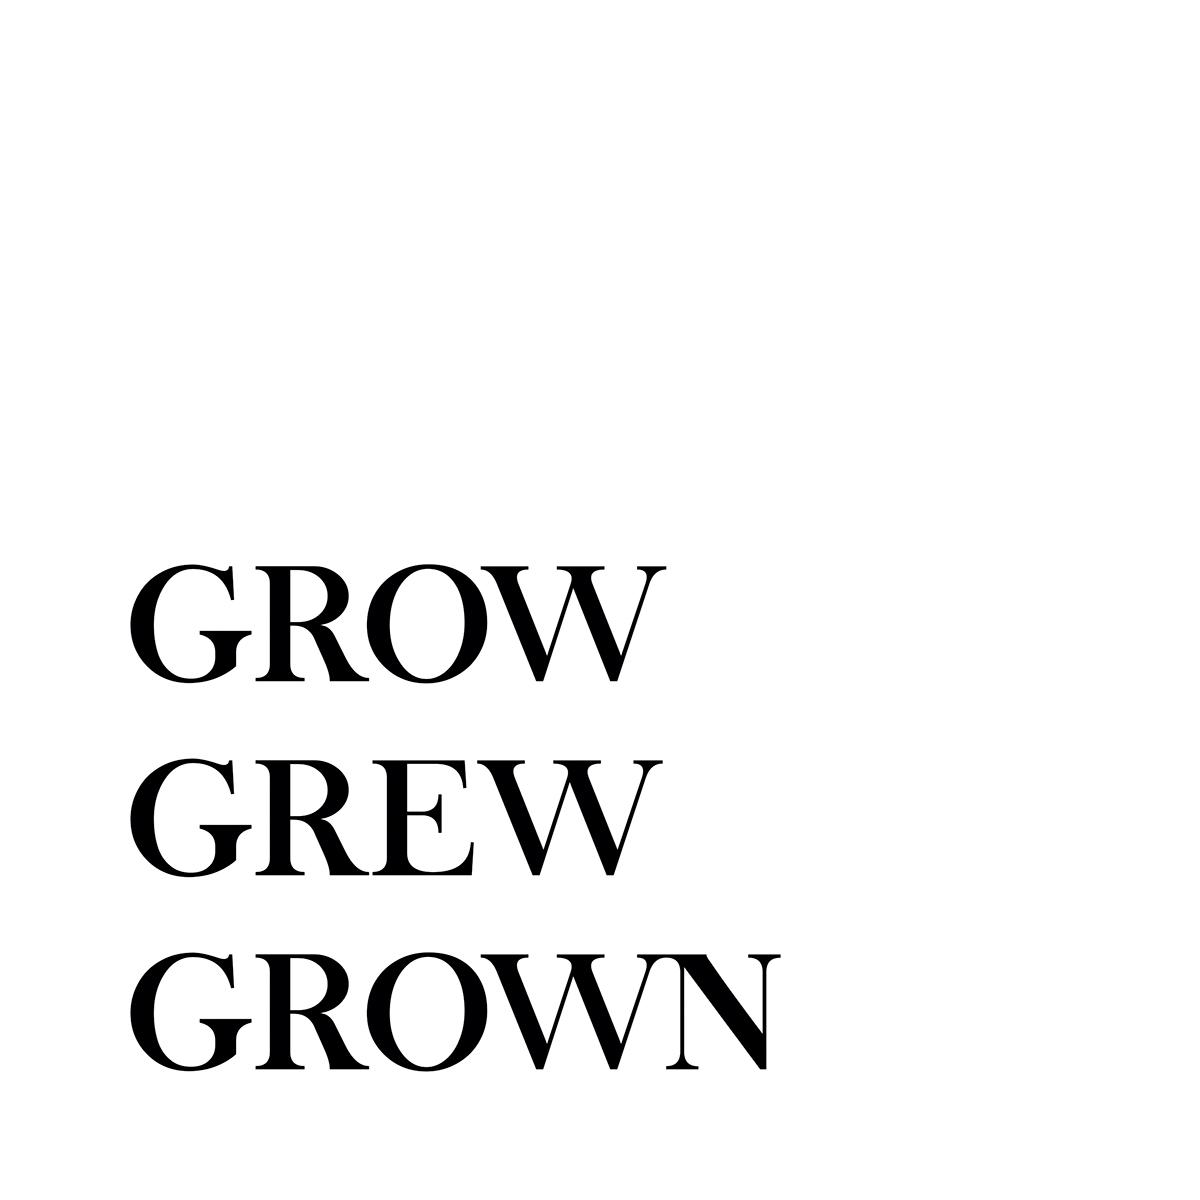 'GROW GREW GROWN'. Mi libro visual. on Behance